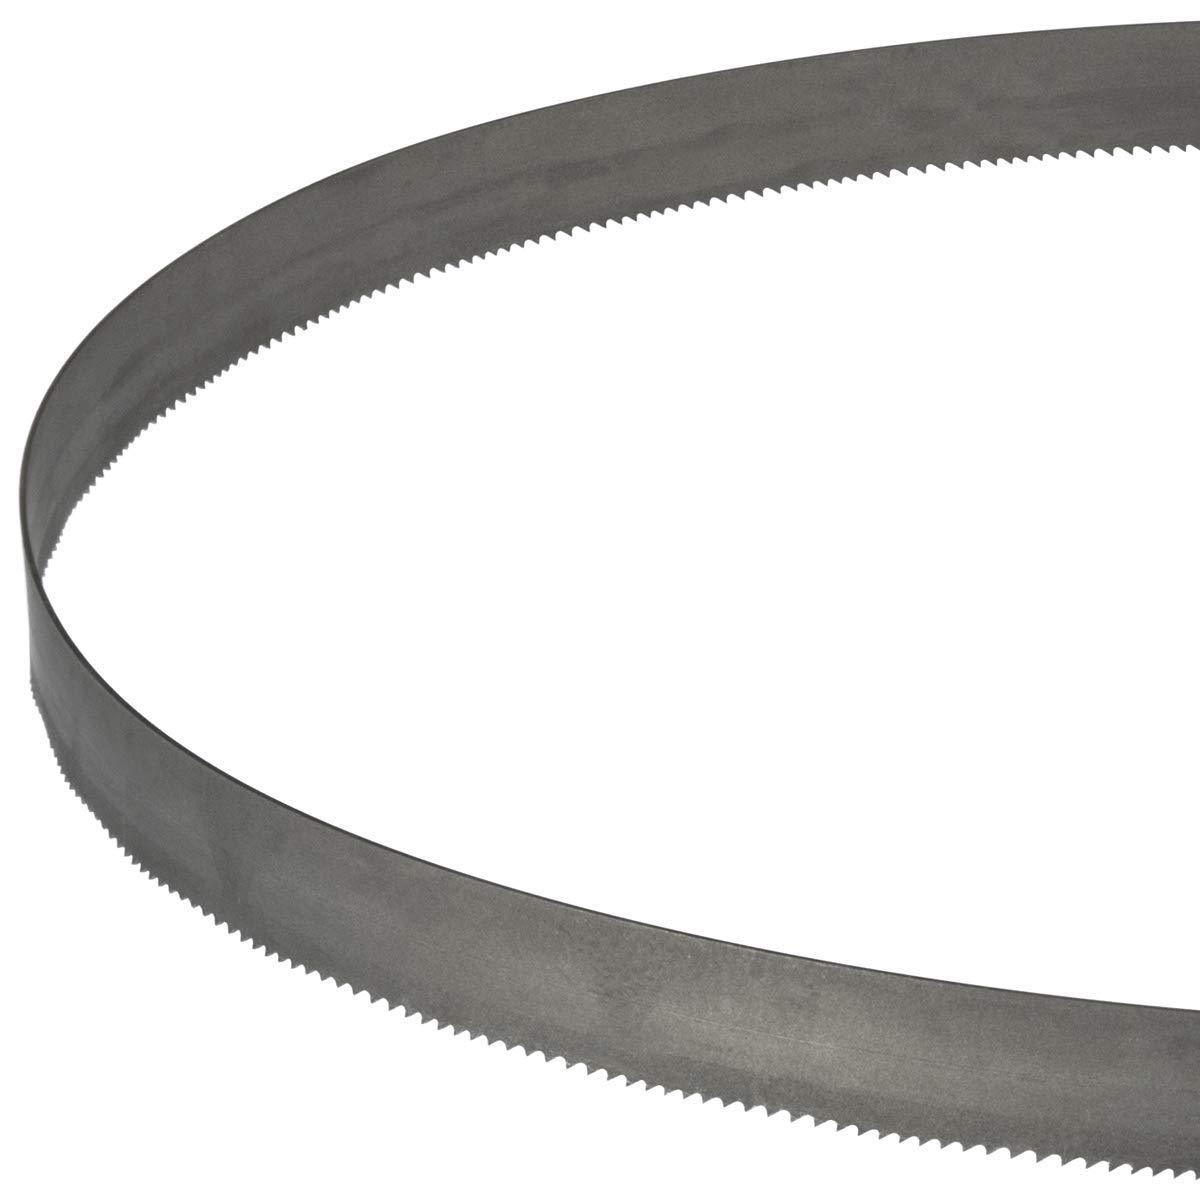 "MK Morse Matrix 1/2"" X .020"" X 44 7/8"" Bi-Metal Bandsaw Blade 18W Teeth Per Inch - 100 Each/Pack"